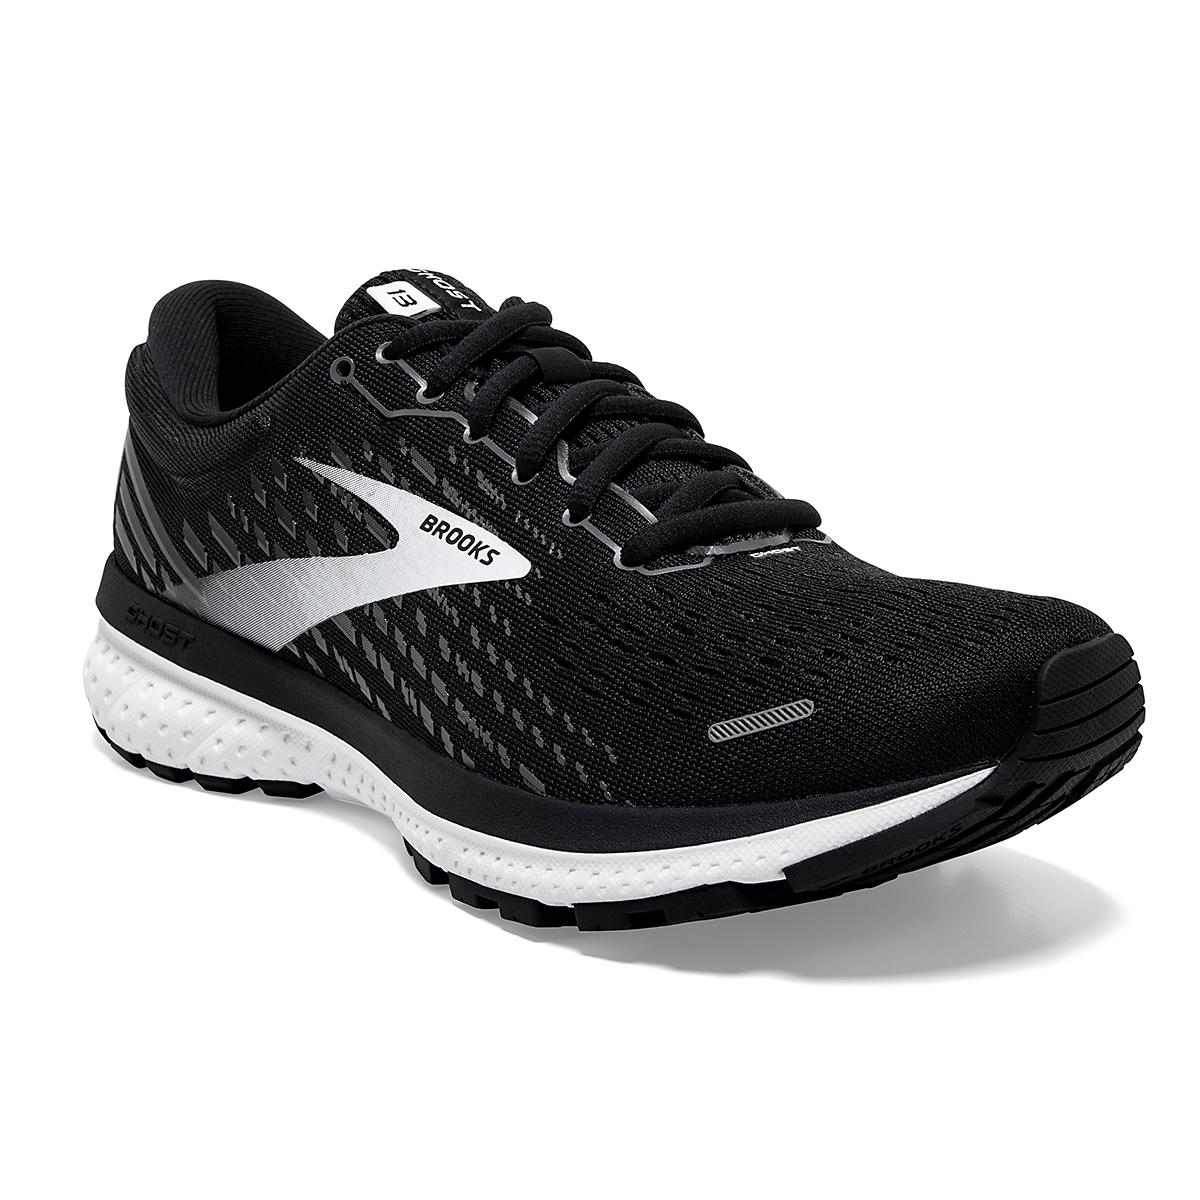 Women's Brooks Ghost 13 Running Shoe - Color: Black/Blackened - Size: 5 - Width: Regular, Black/Blackened, large, image 4